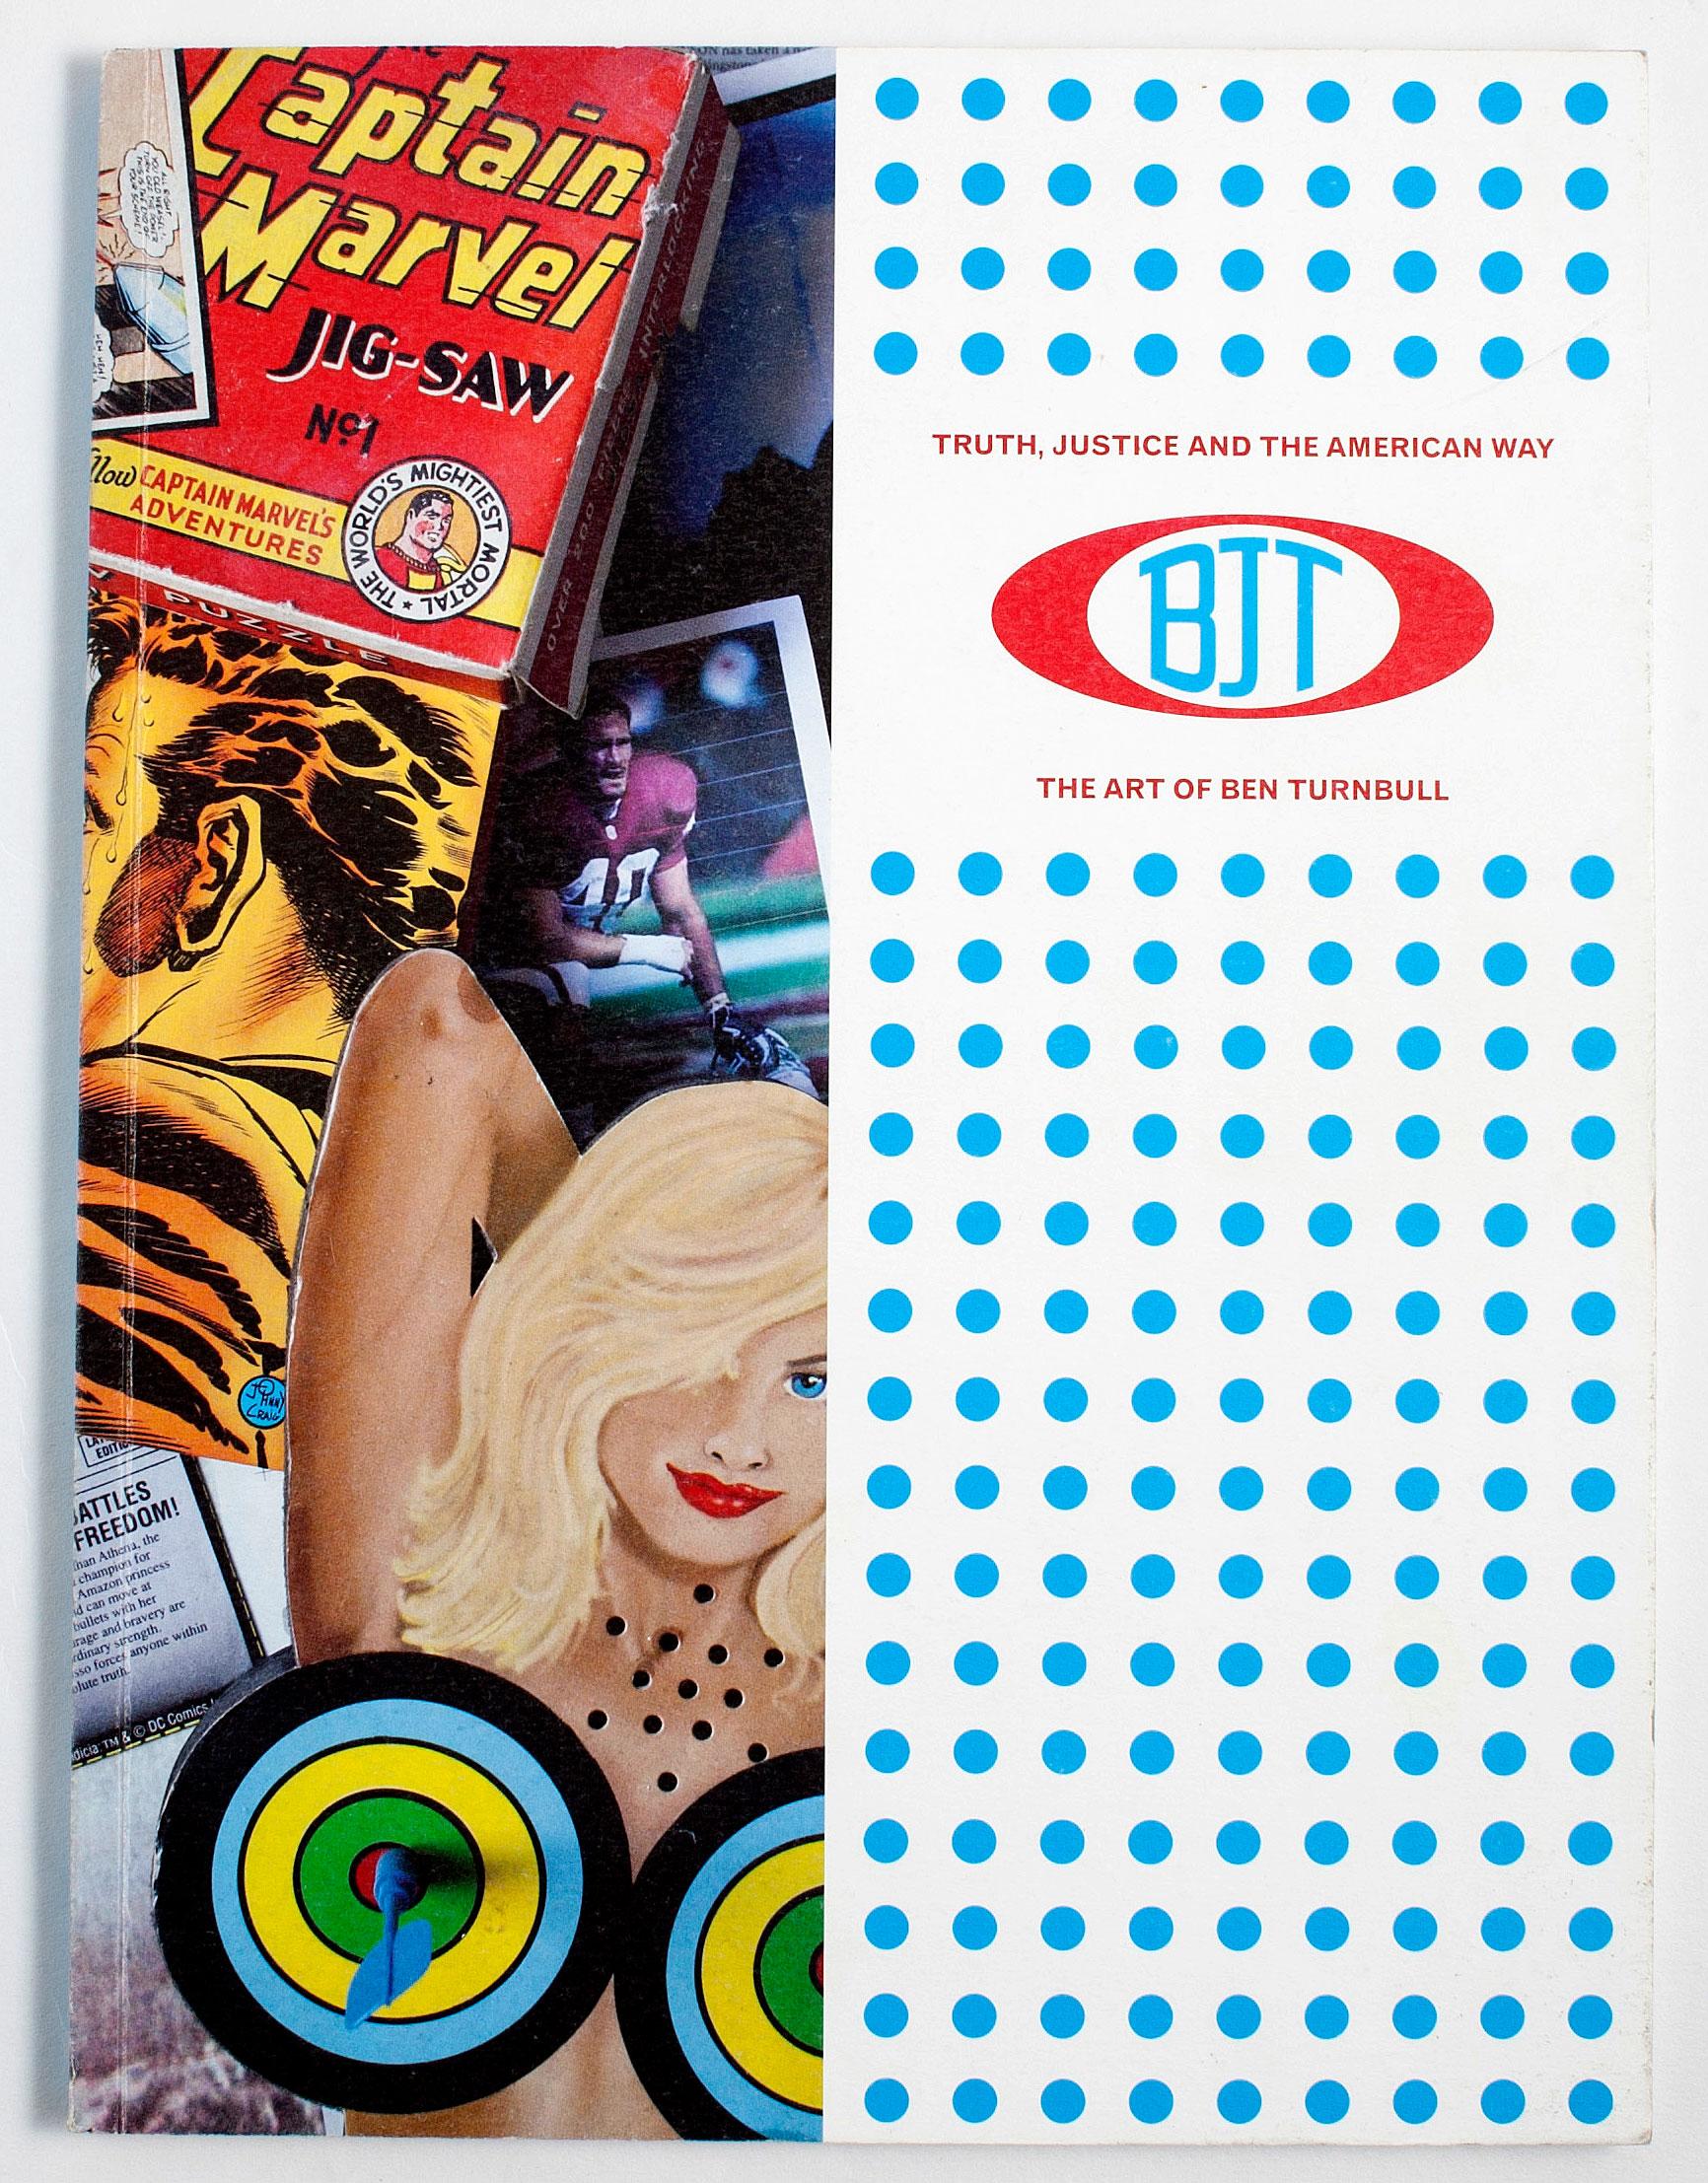 epm-print-management-bristol-ben-turnball-art-books-1.jpg